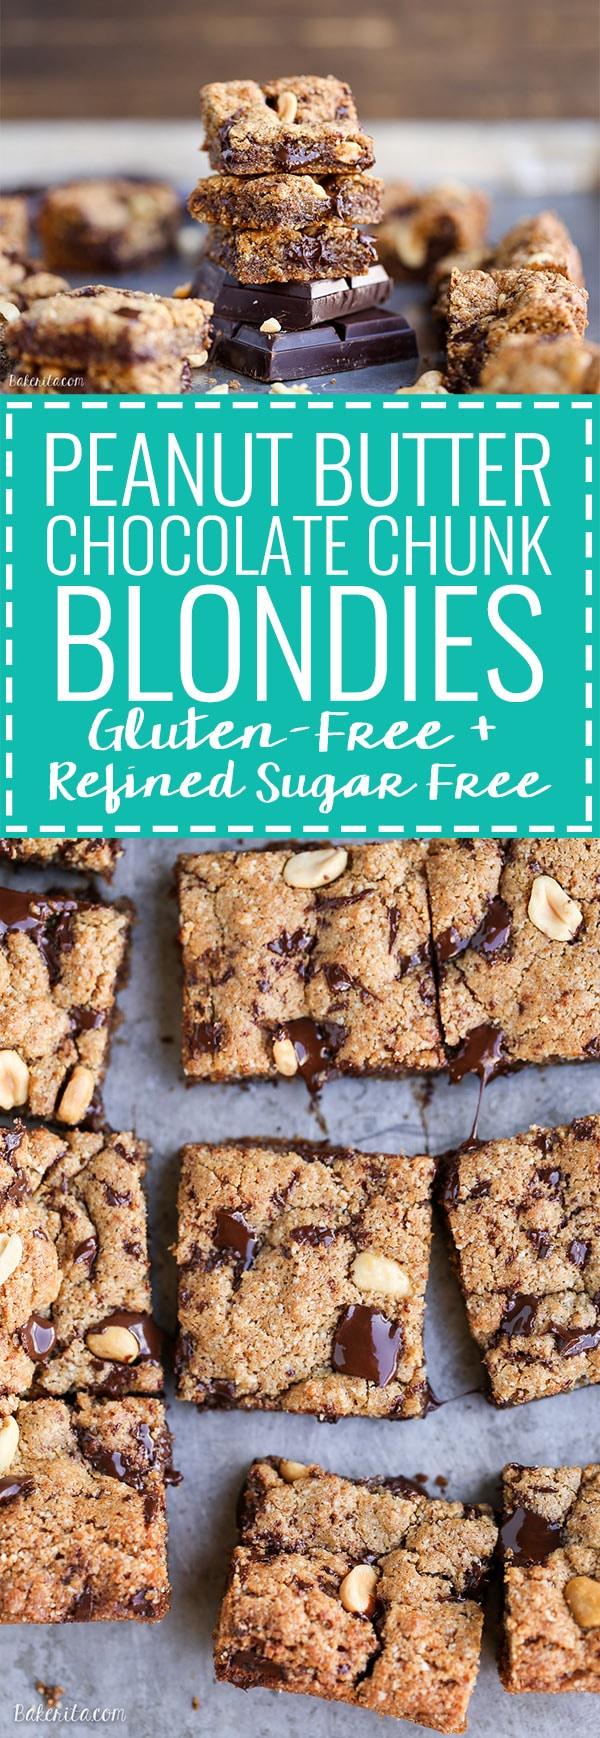 Peanut Butter Chocolate Chunk Blondies (GF + Refined SF) - Bakerita